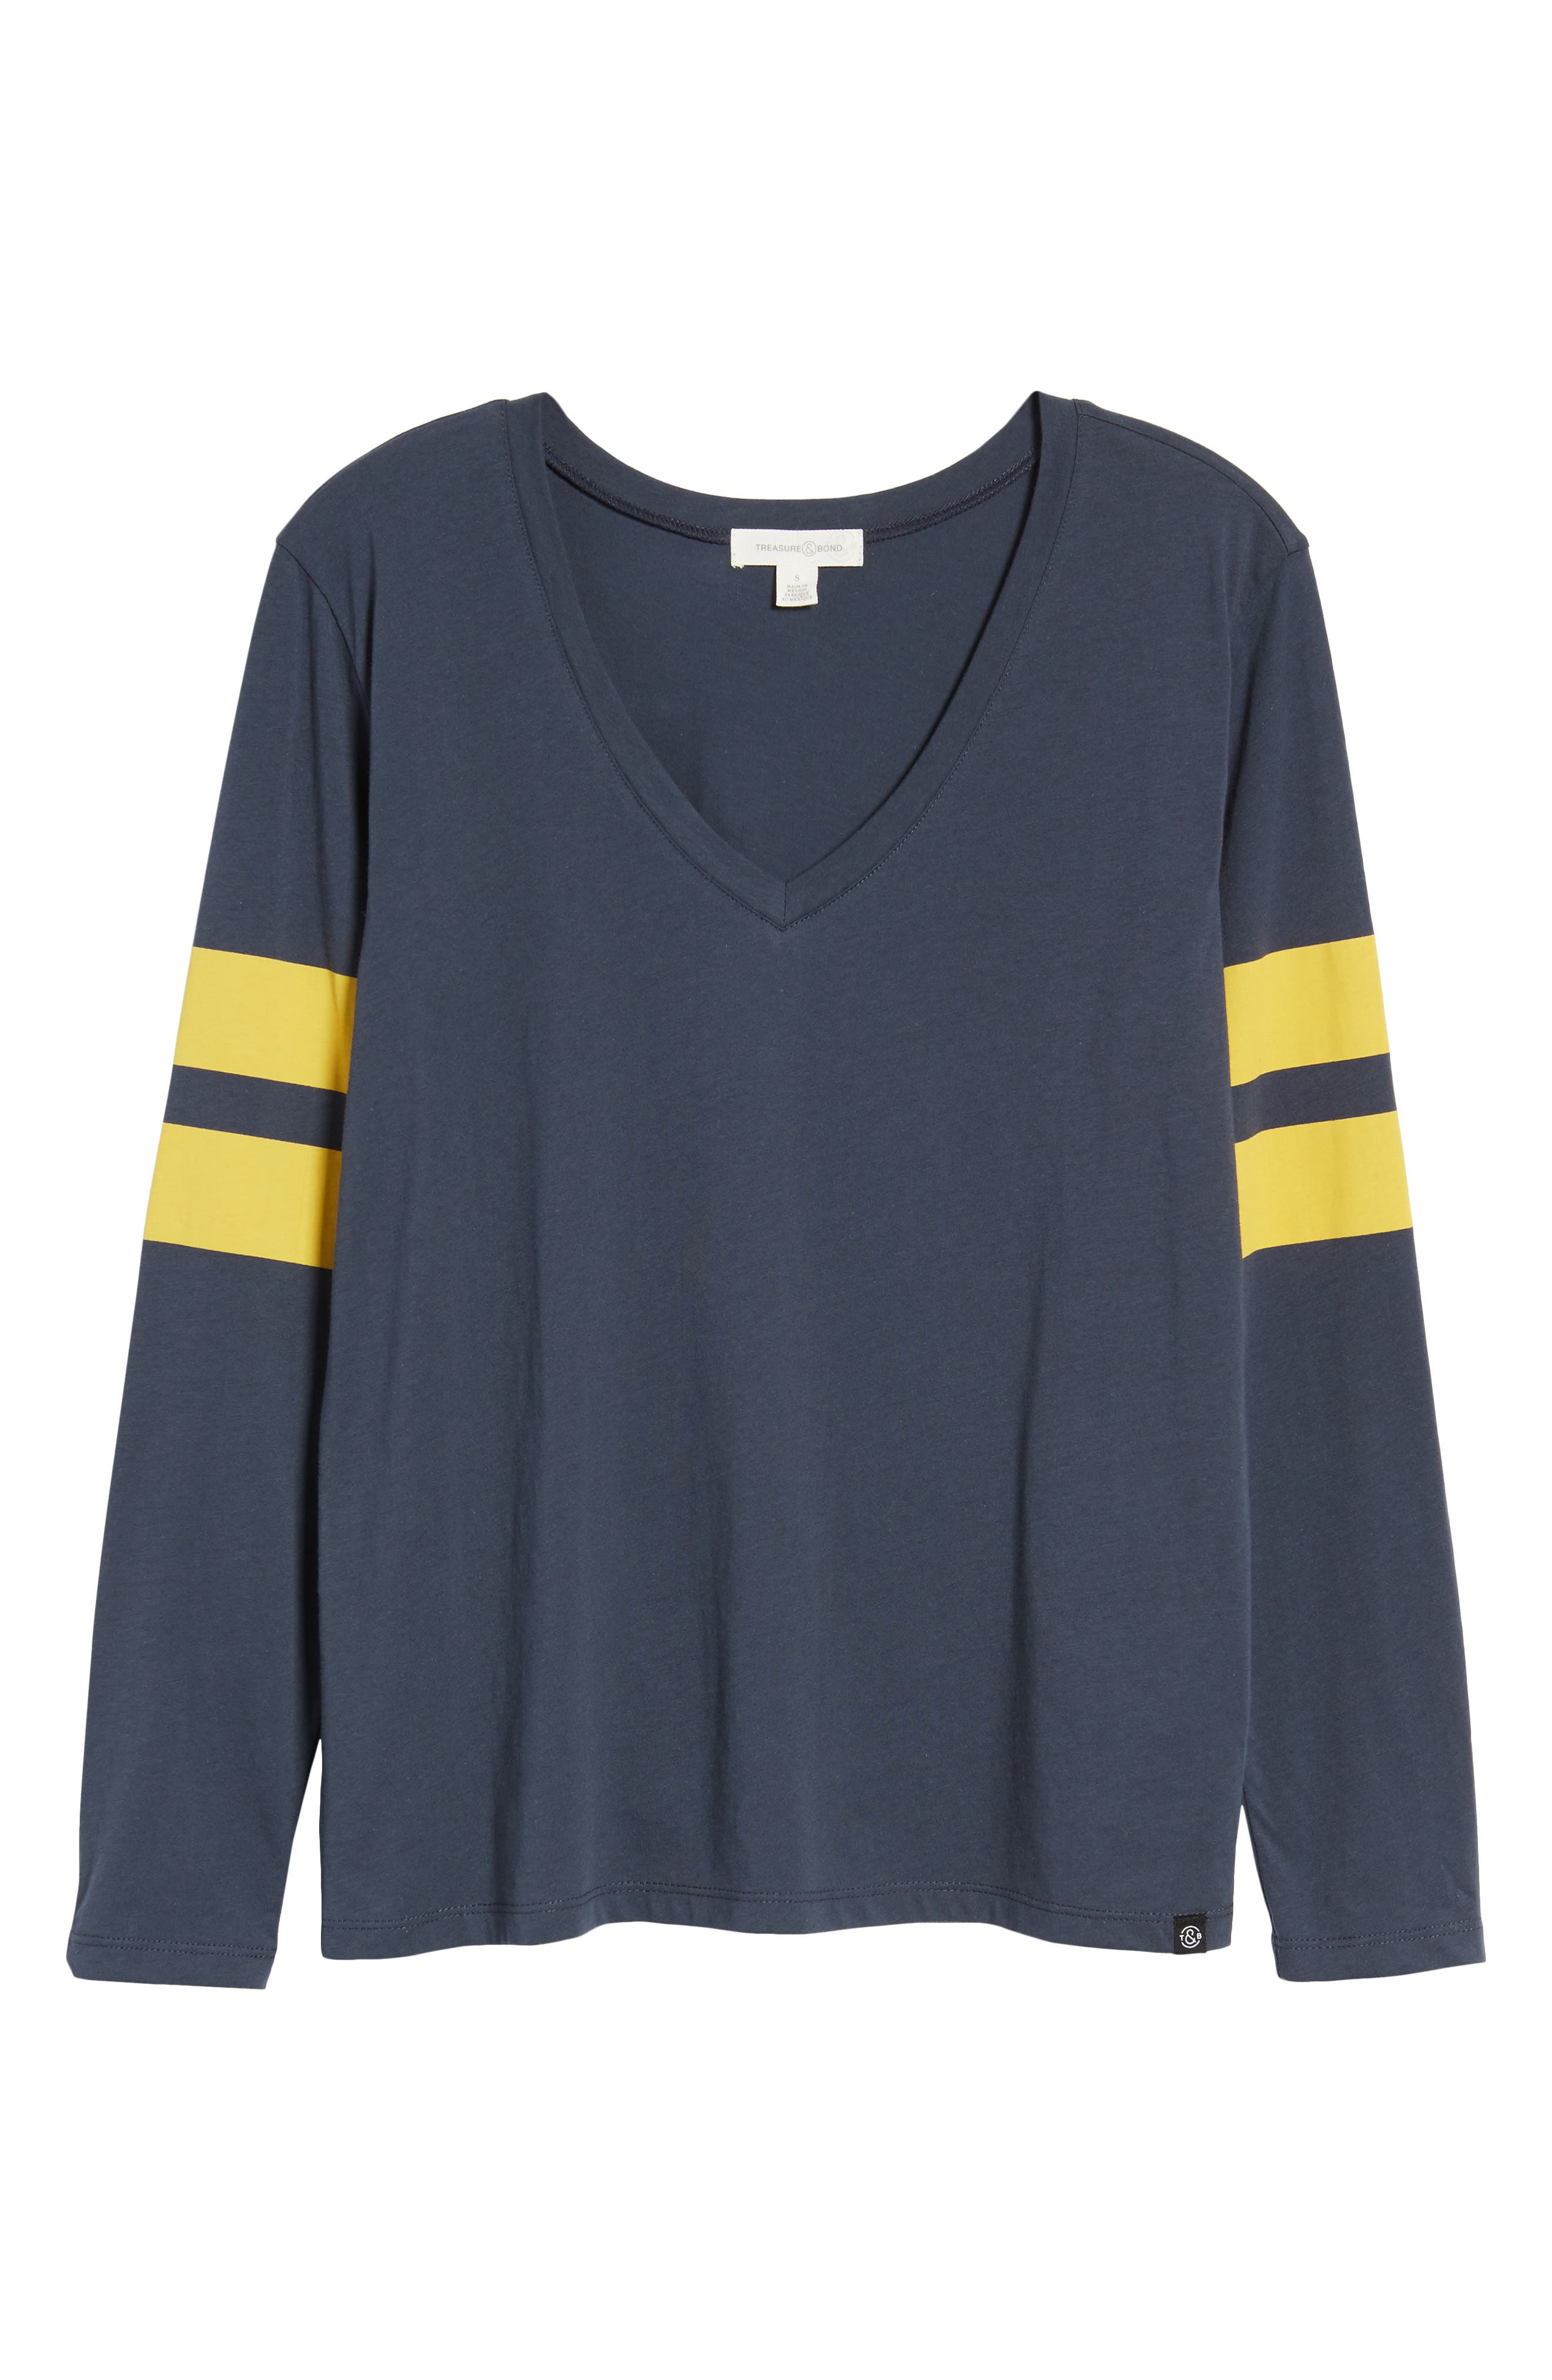 Varsity Stripe Tee,                             Alternate thumbnail 6, color,                             Navy Blue- Yellow Combo